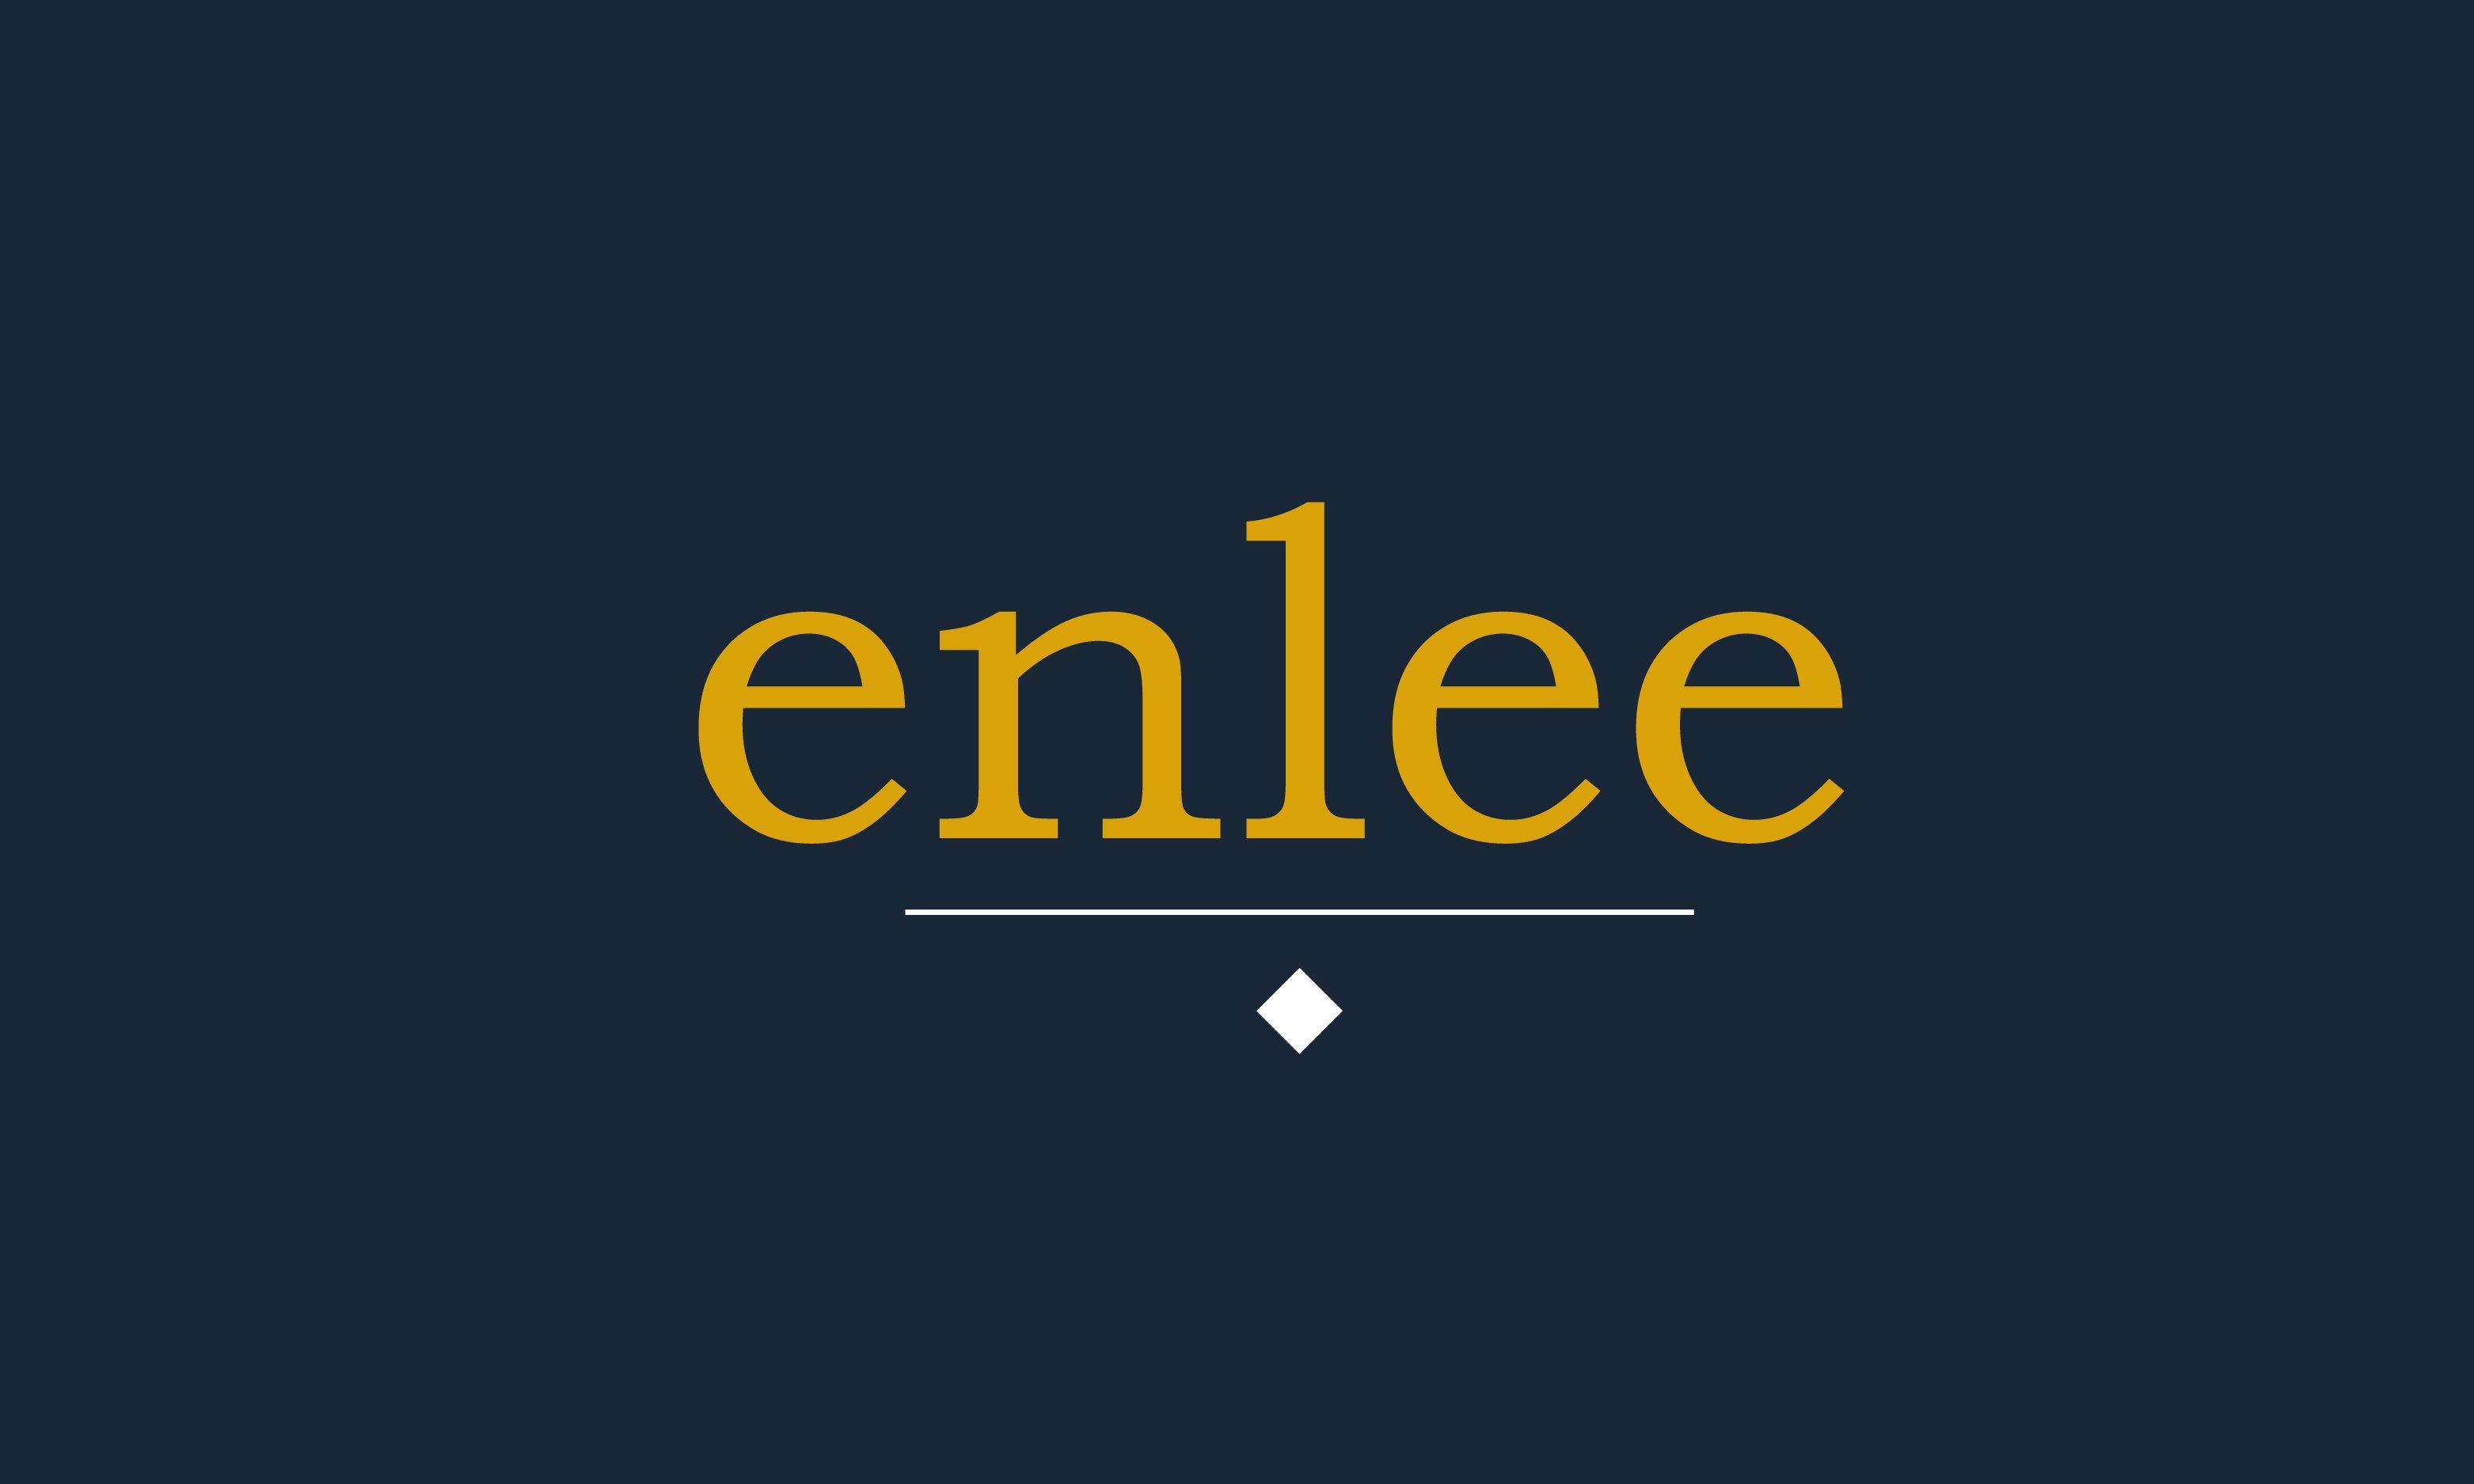 Enlee.com